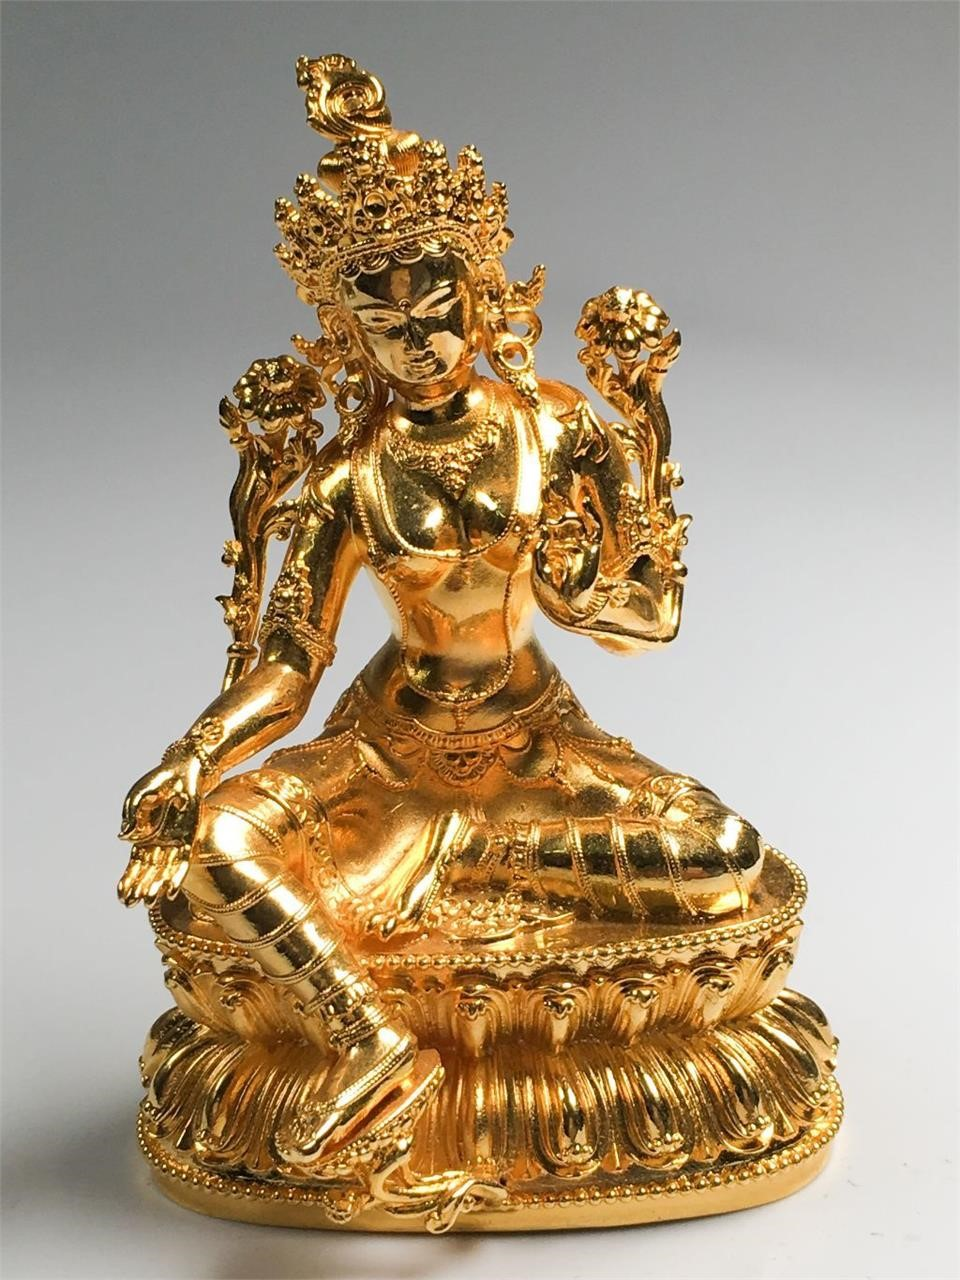 Jewelry, antique ceramics, decorations online auction